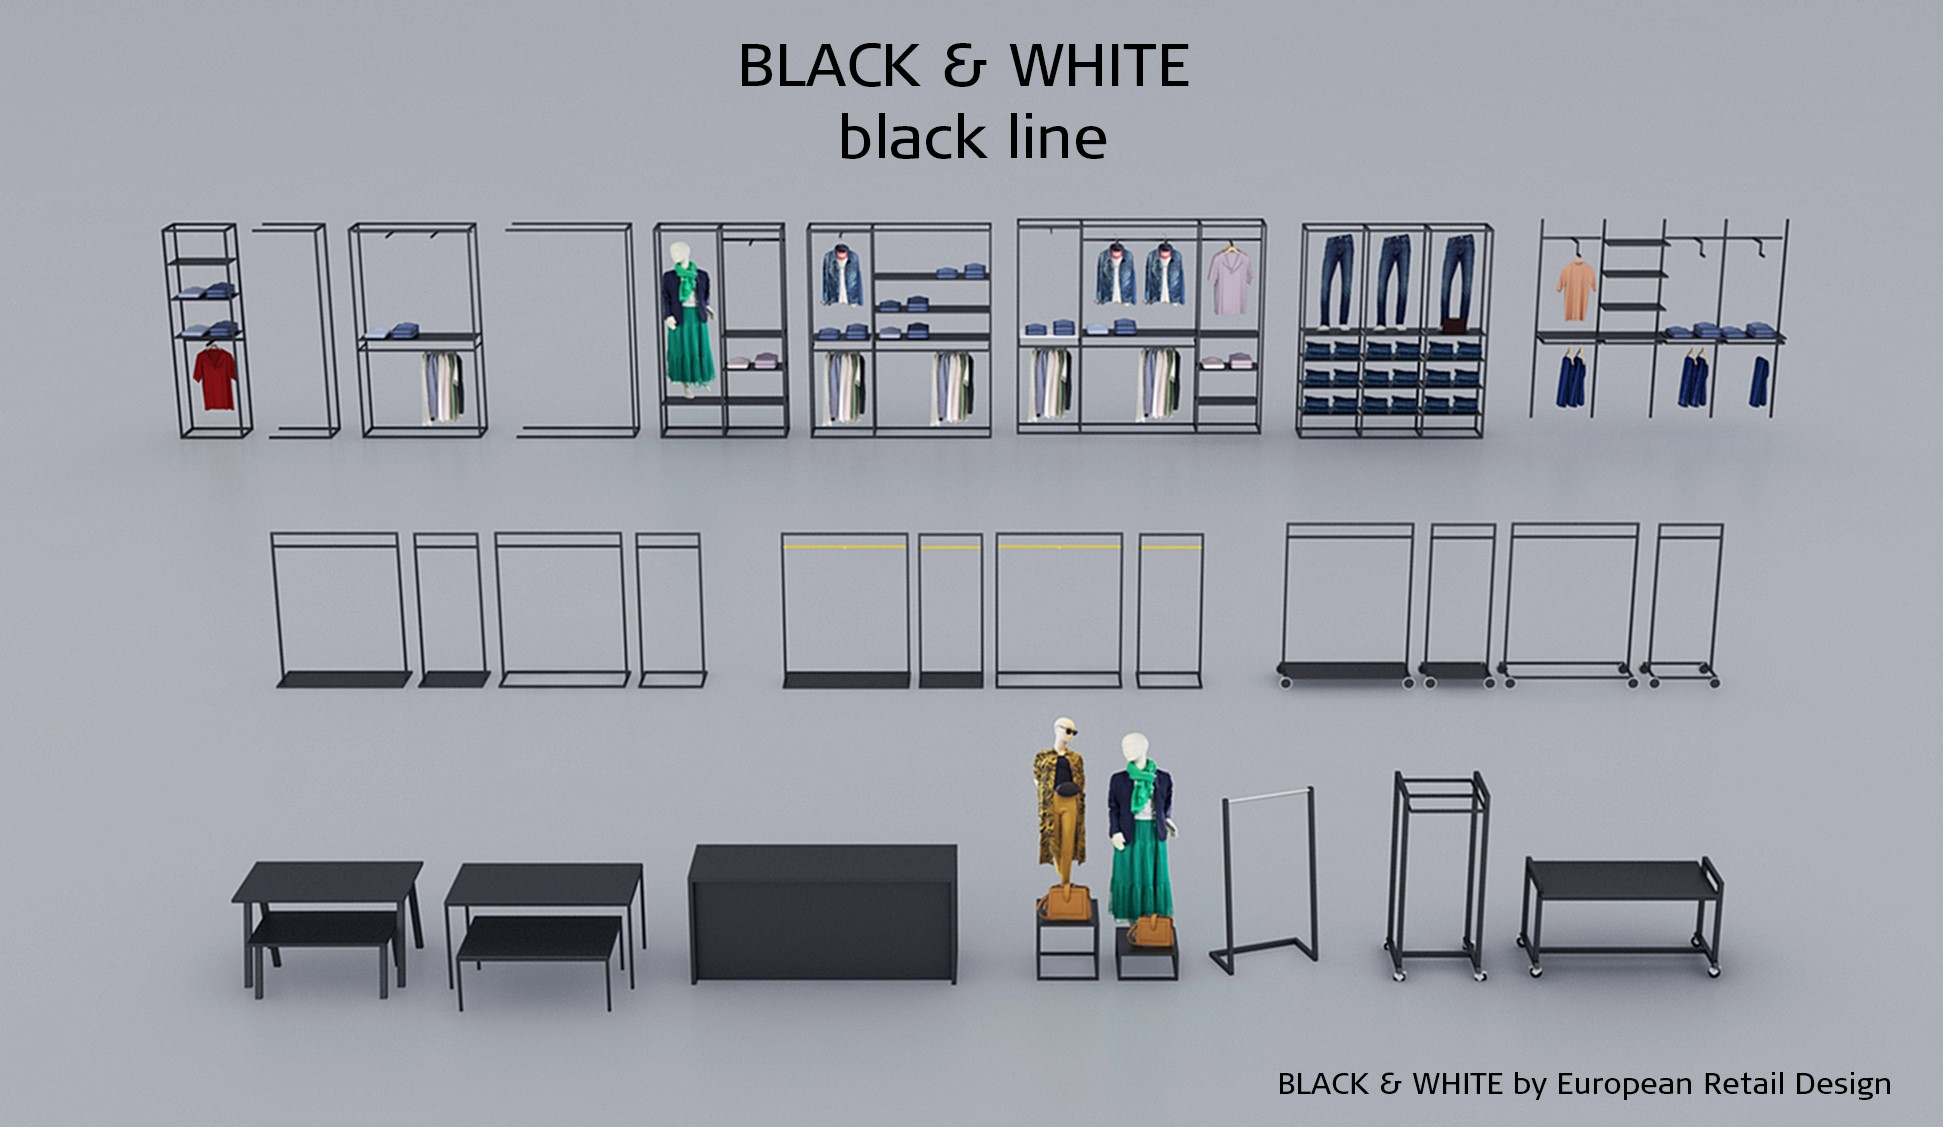 Inventar til butik i sort overflade. Butiksinventar. Butiksindretning i sort.